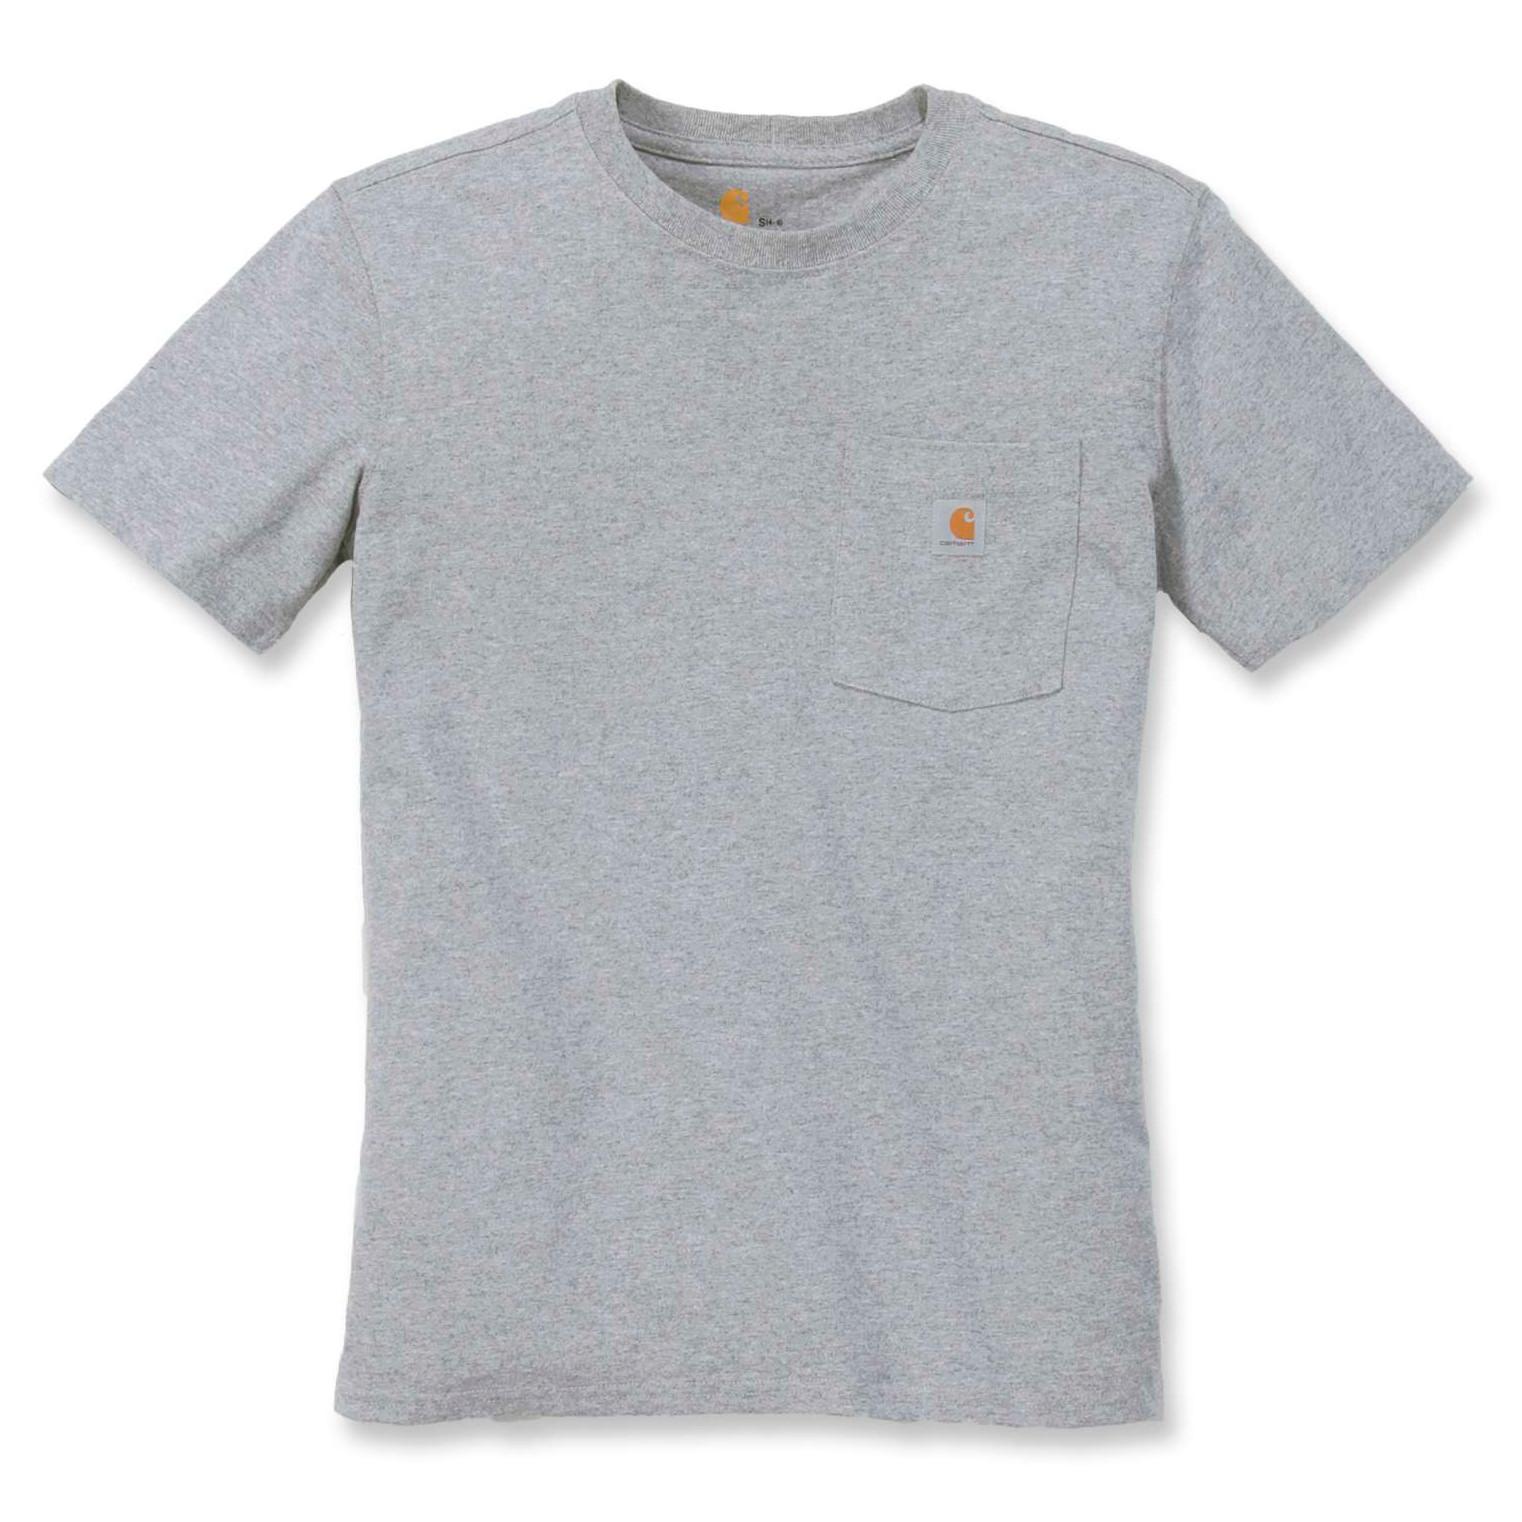 Футболка женская Carhartt WK87 Workwear Pocket T-Shirt - 103067 (Heather Grey)